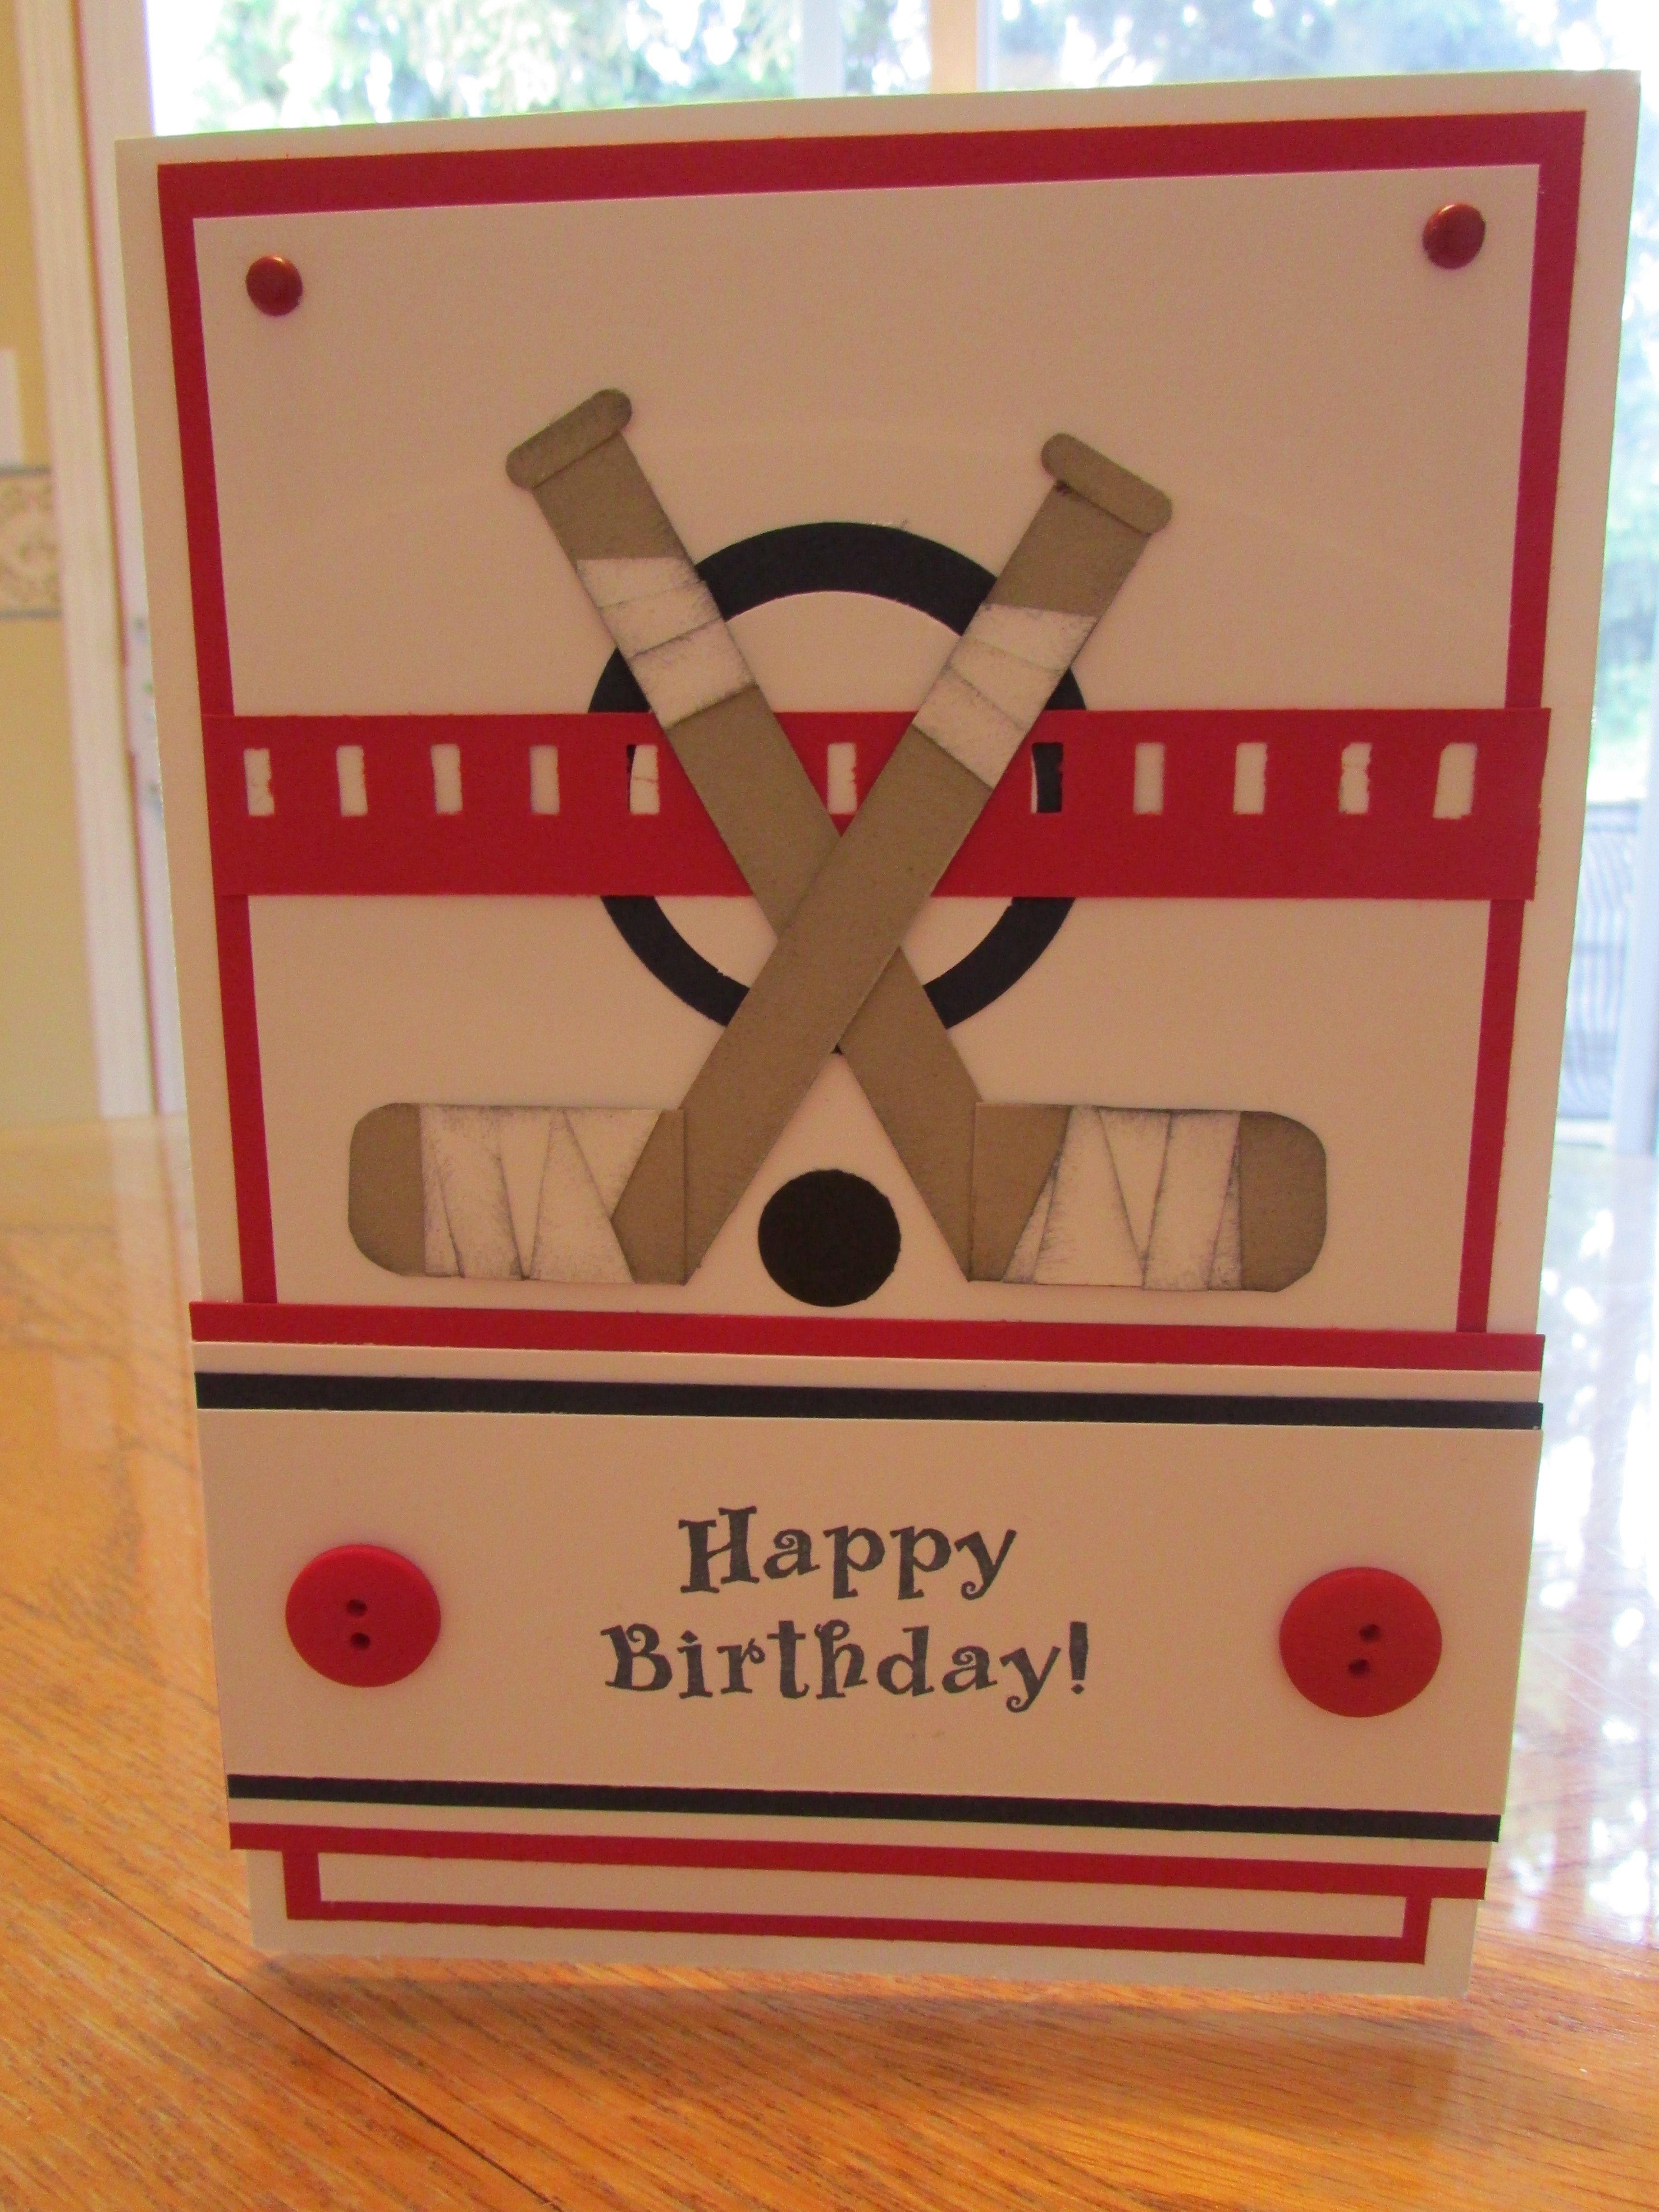 Hockey Birthday Card My punch art Pinterest – Hockey Birthday Card